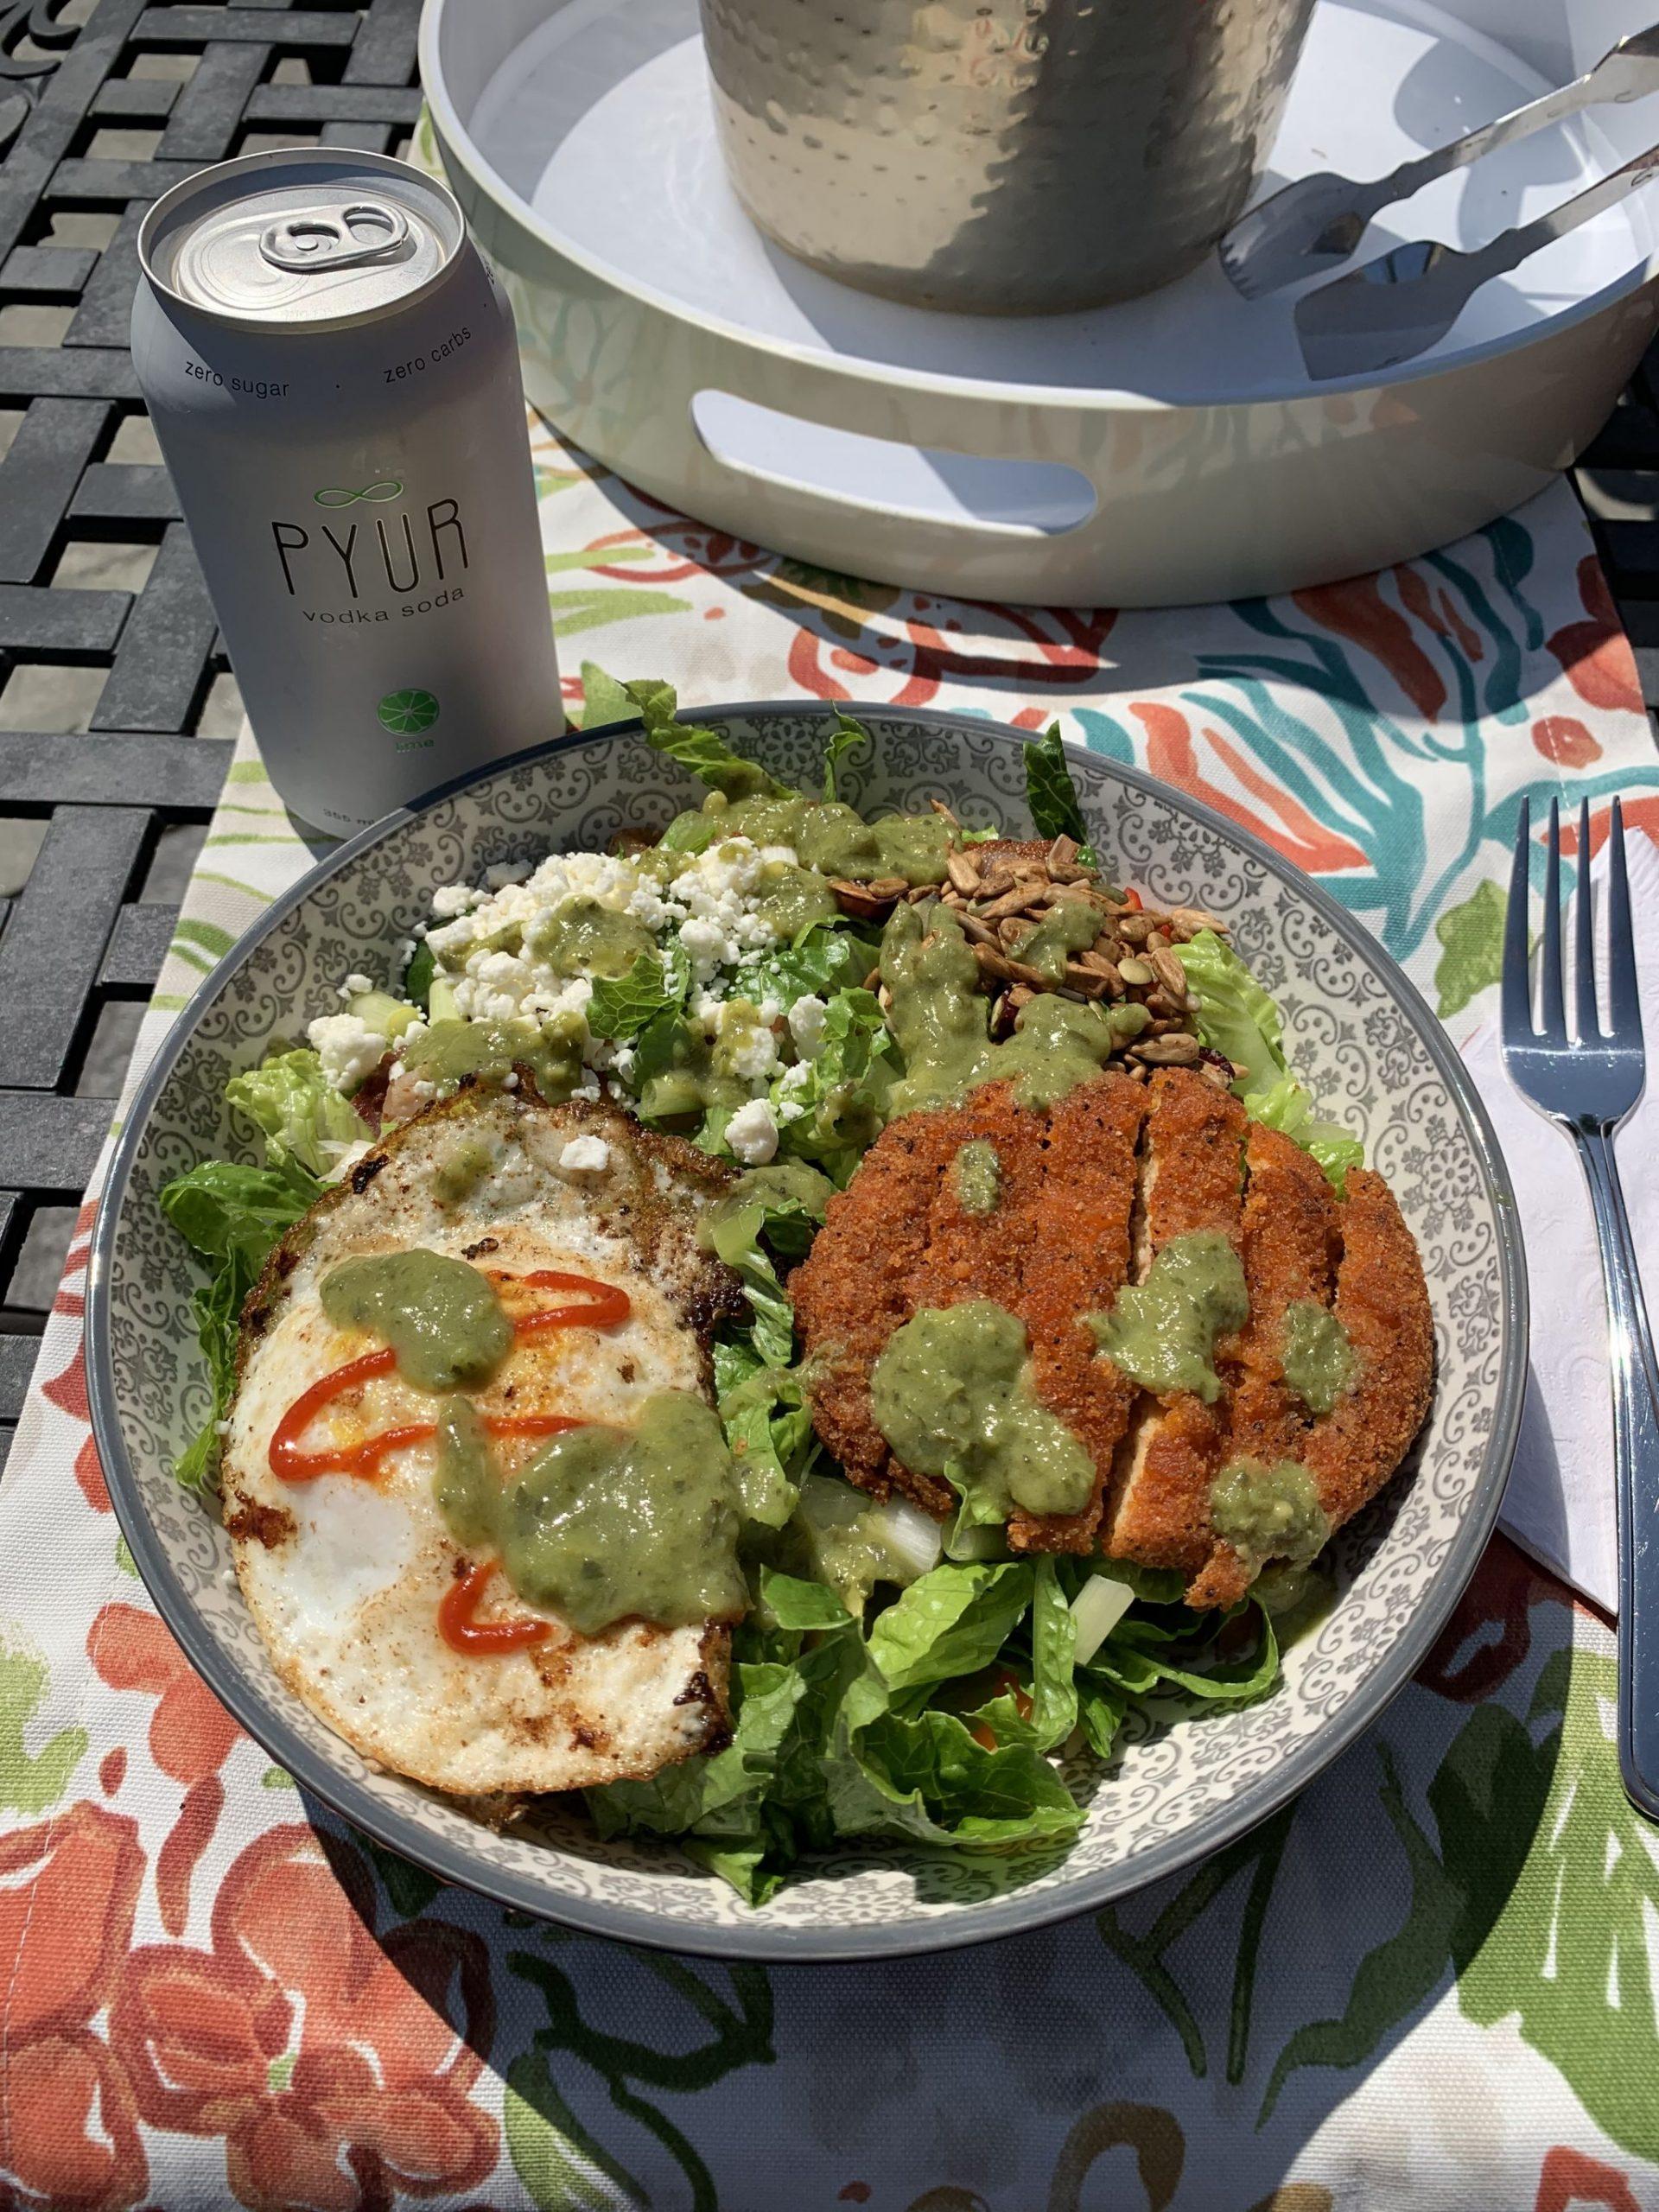 Spicy Chicken, Fried Egg & Feta Salad With Avocado Dressing